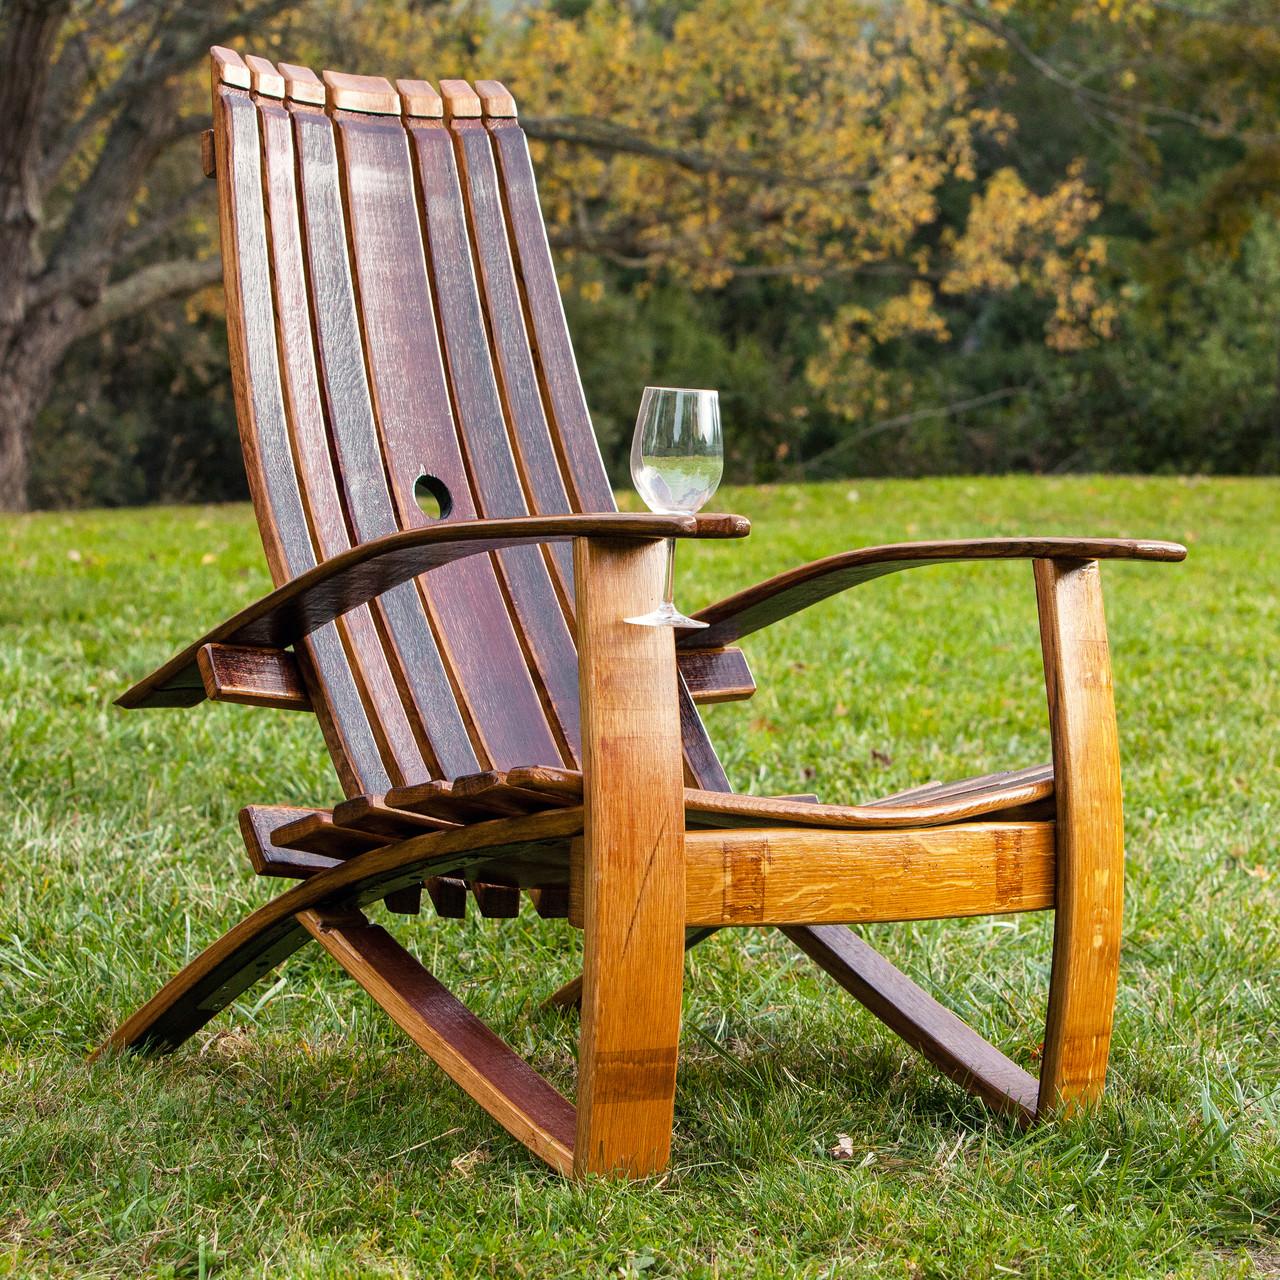 barrel stave adirondack chair plans executive chairman vs ceo wine